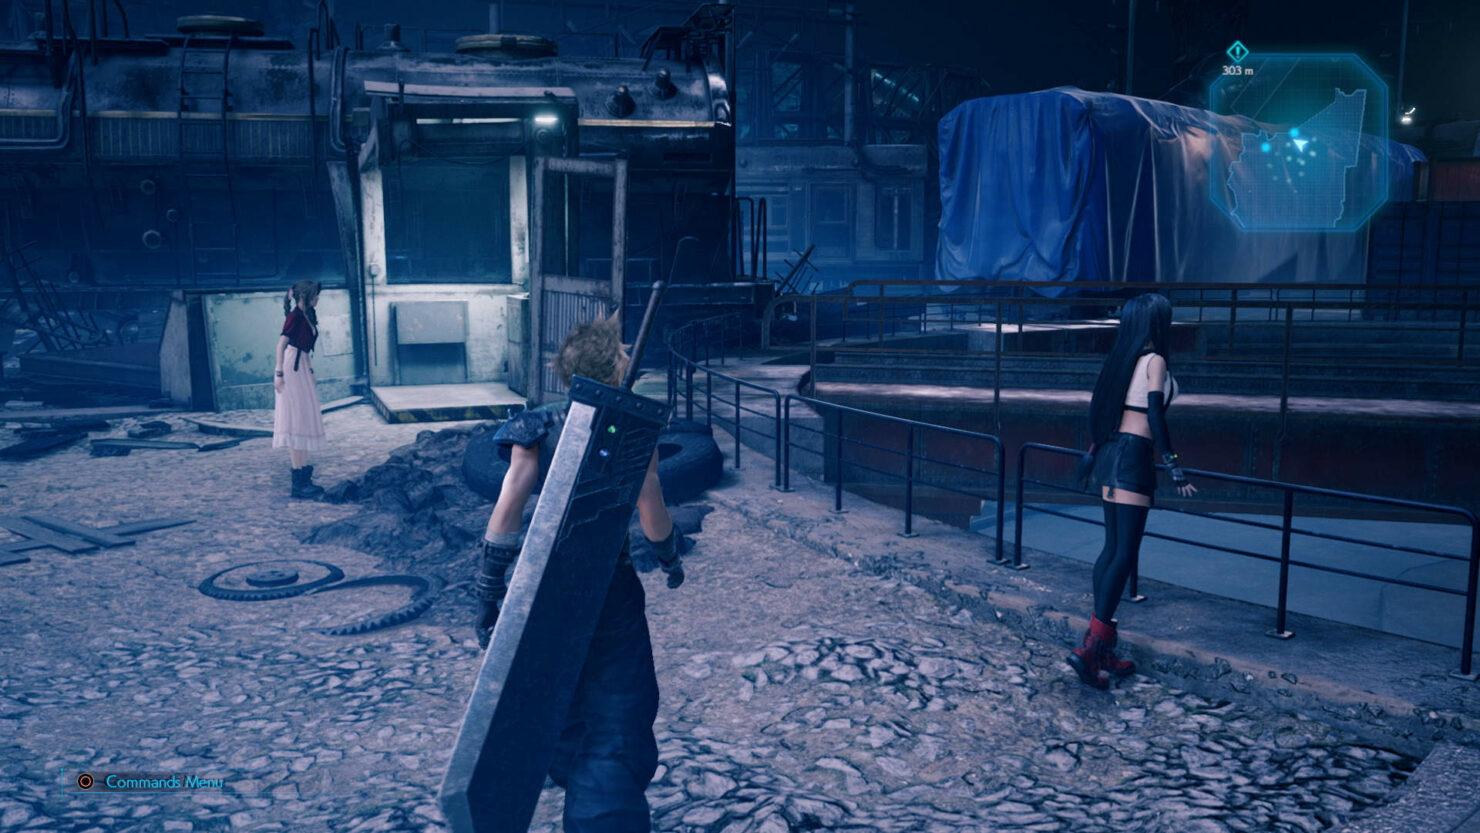 final-fantasy-vii-remake-screenshots-info-475